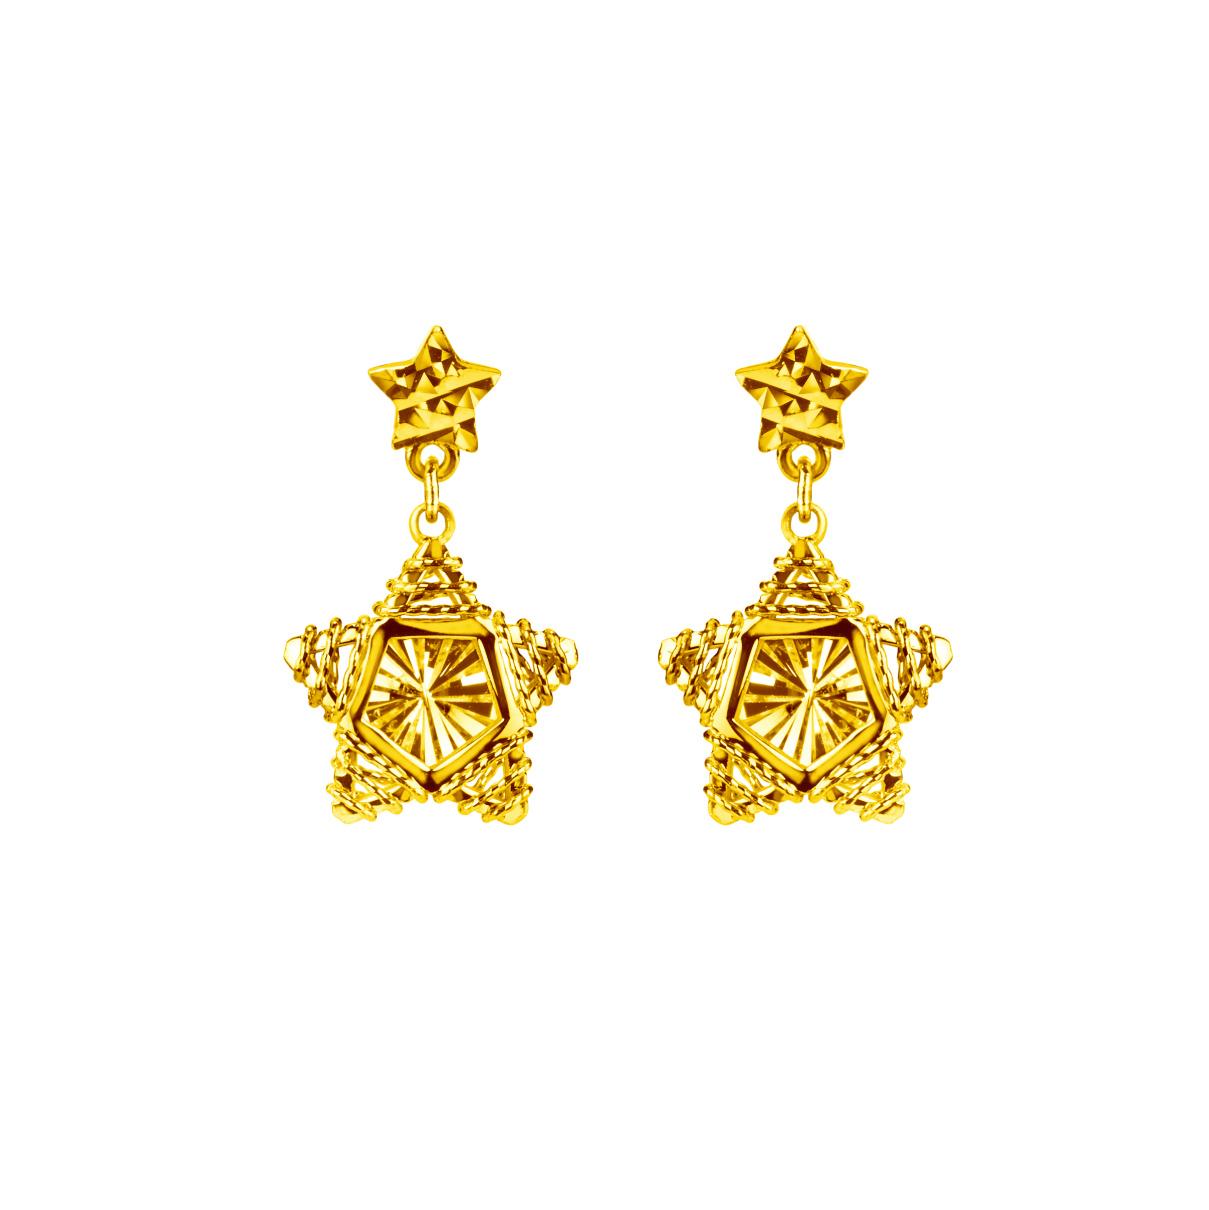 Goldstyle Star Earrings